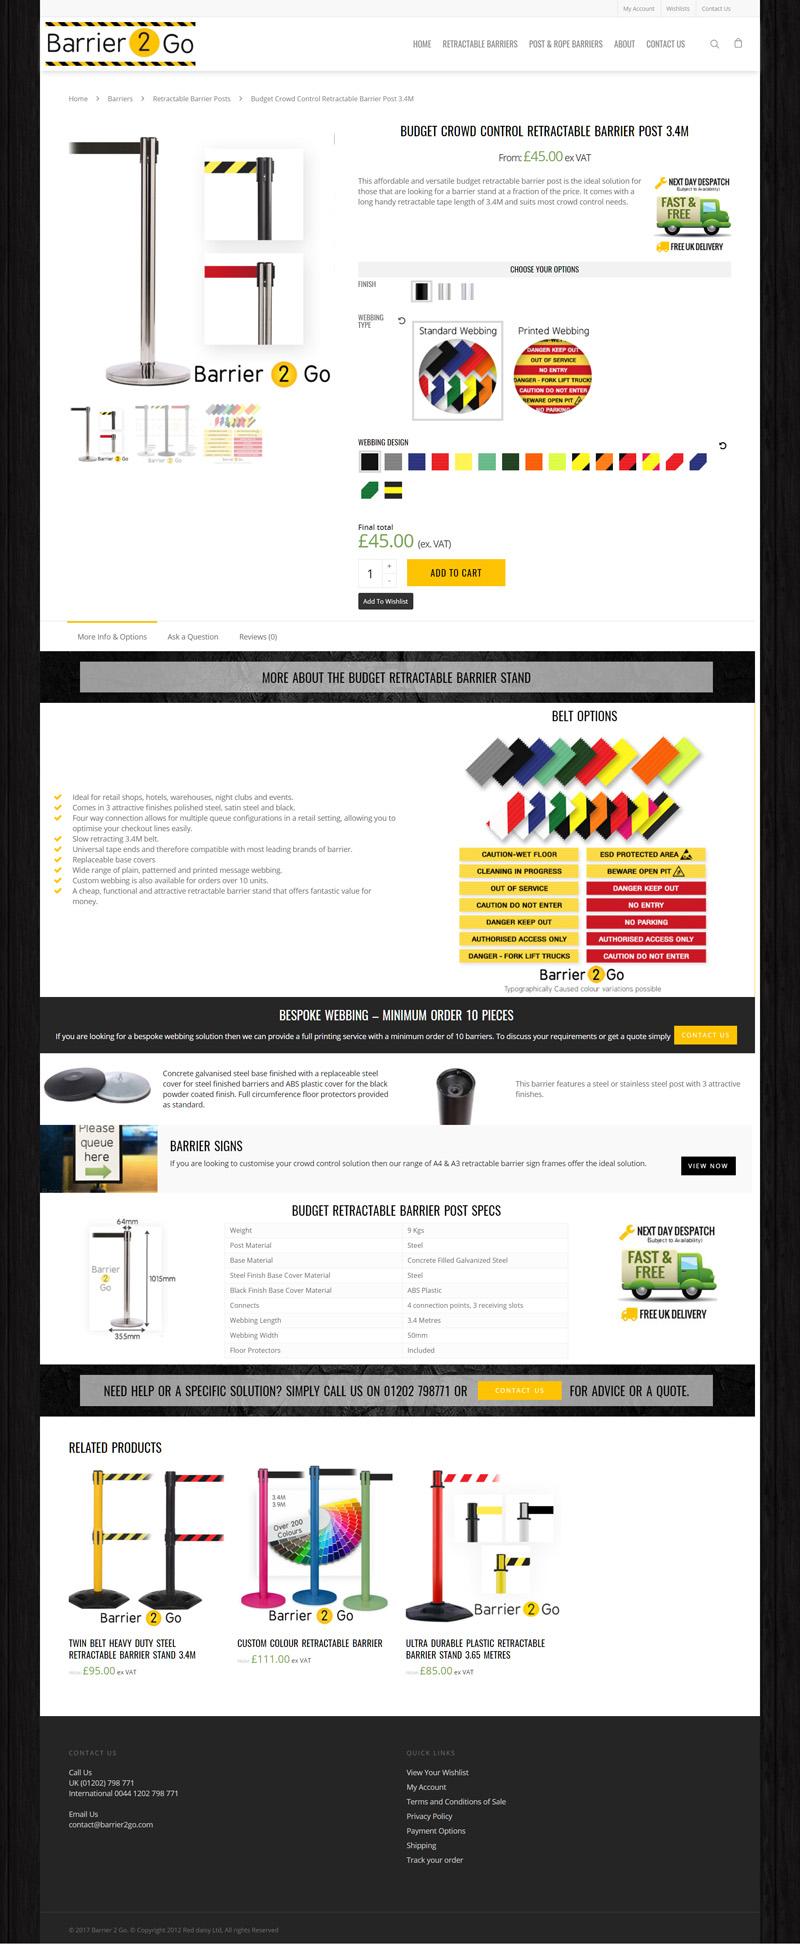 screencapture-barrier2go-barriers-budget-crowd-control-retractable-barrier-post-3-4m-1509201268653